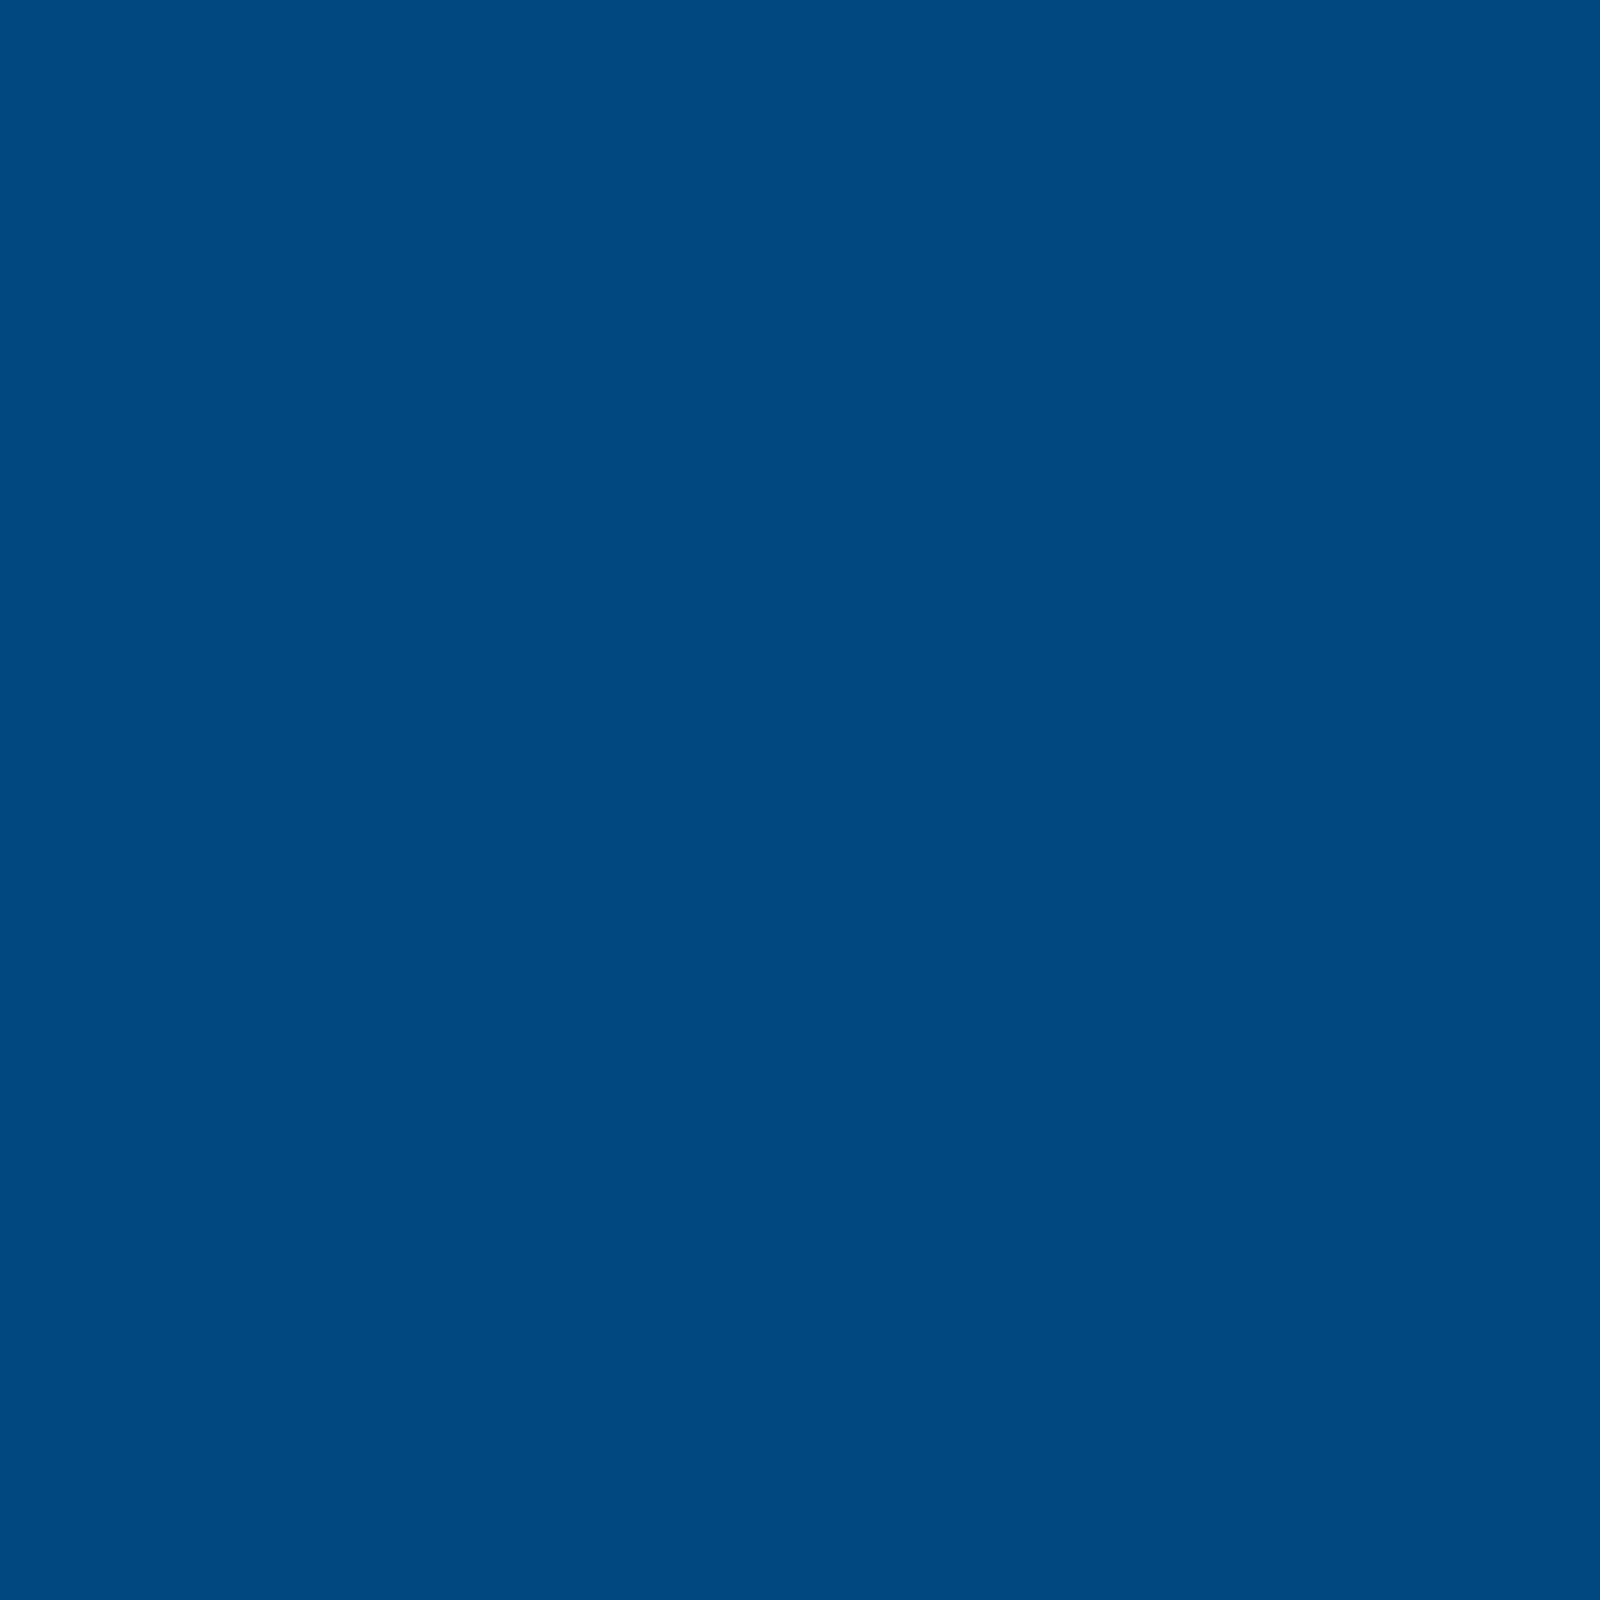 kobra albastru cerneală